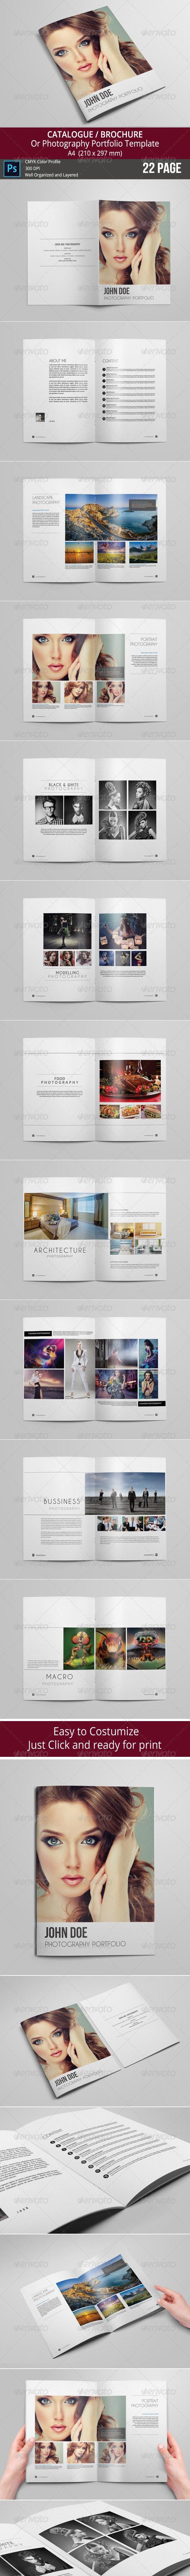 Catalogue / Brochure / Portfolio - Portfolio Brochures